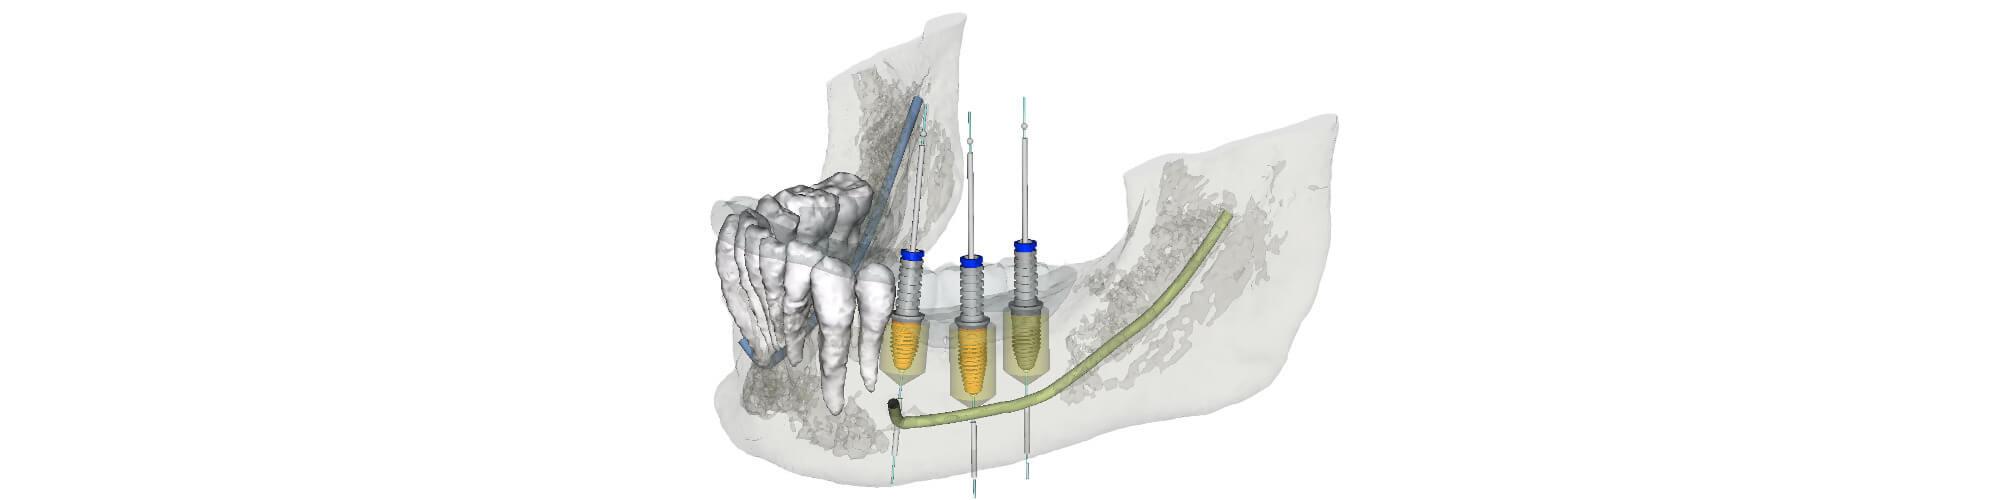 3D Implantatplanung in München